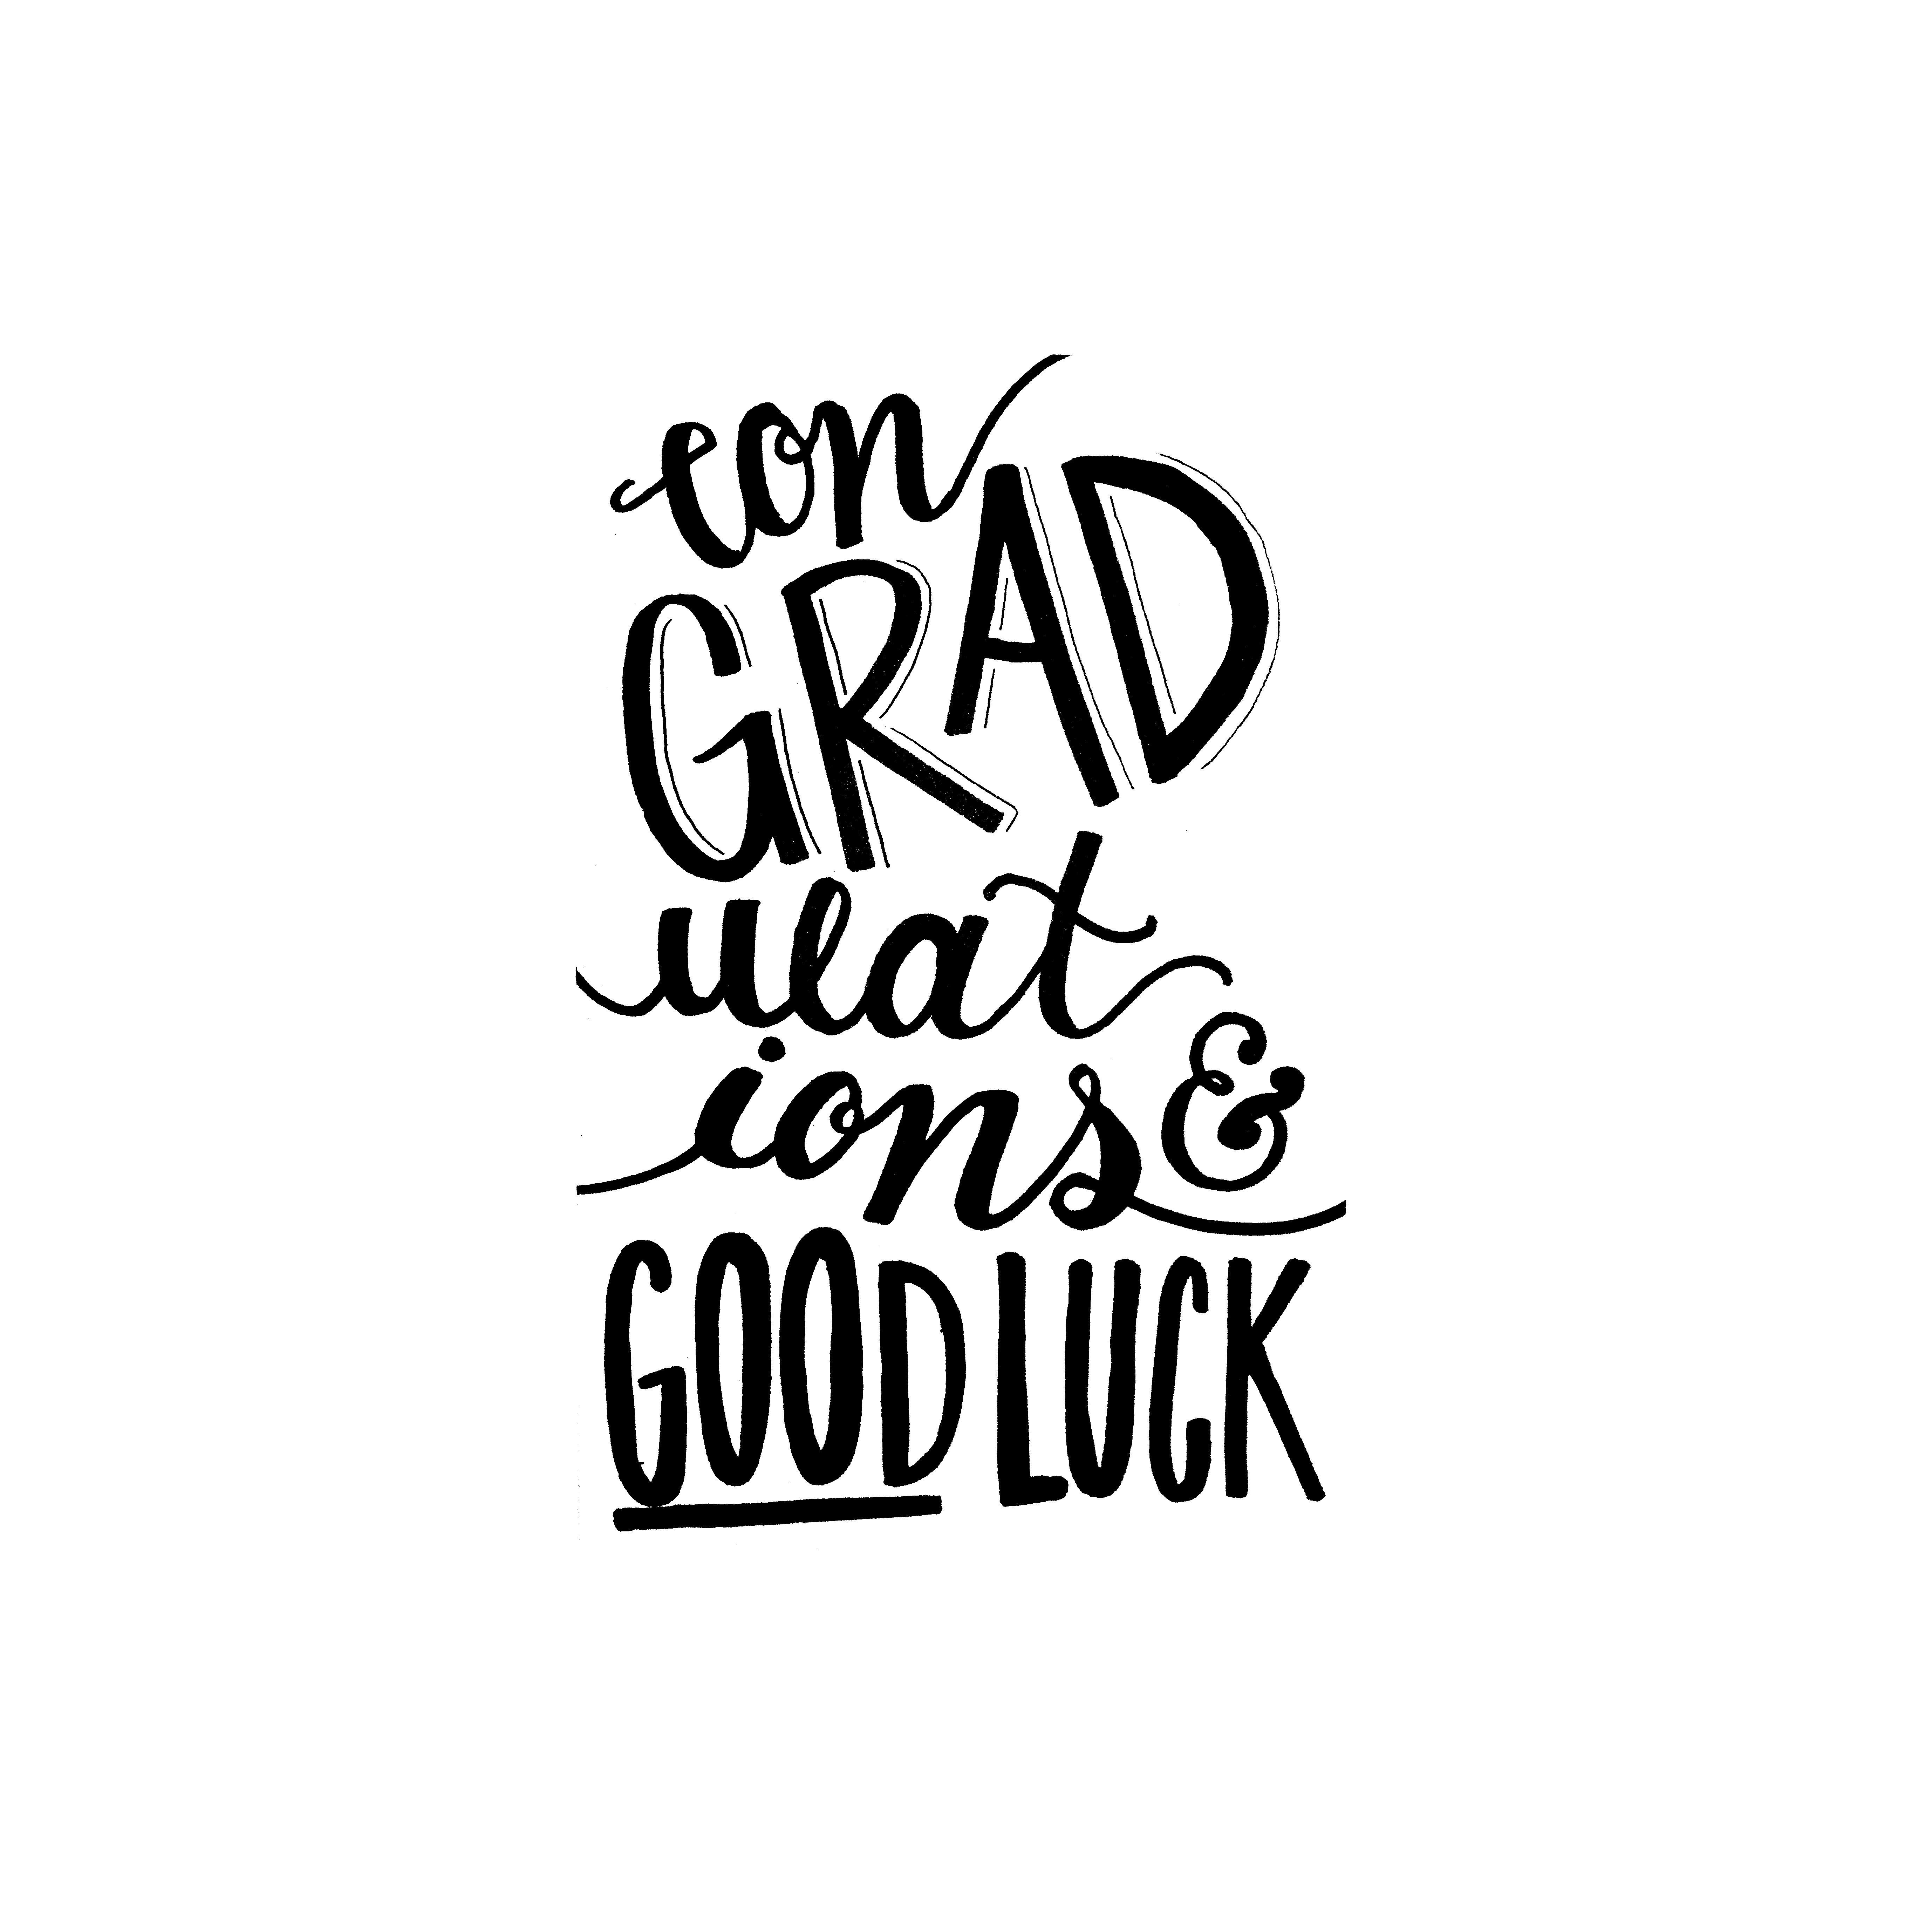 Hand Type Graduation Card Idea congratulations www